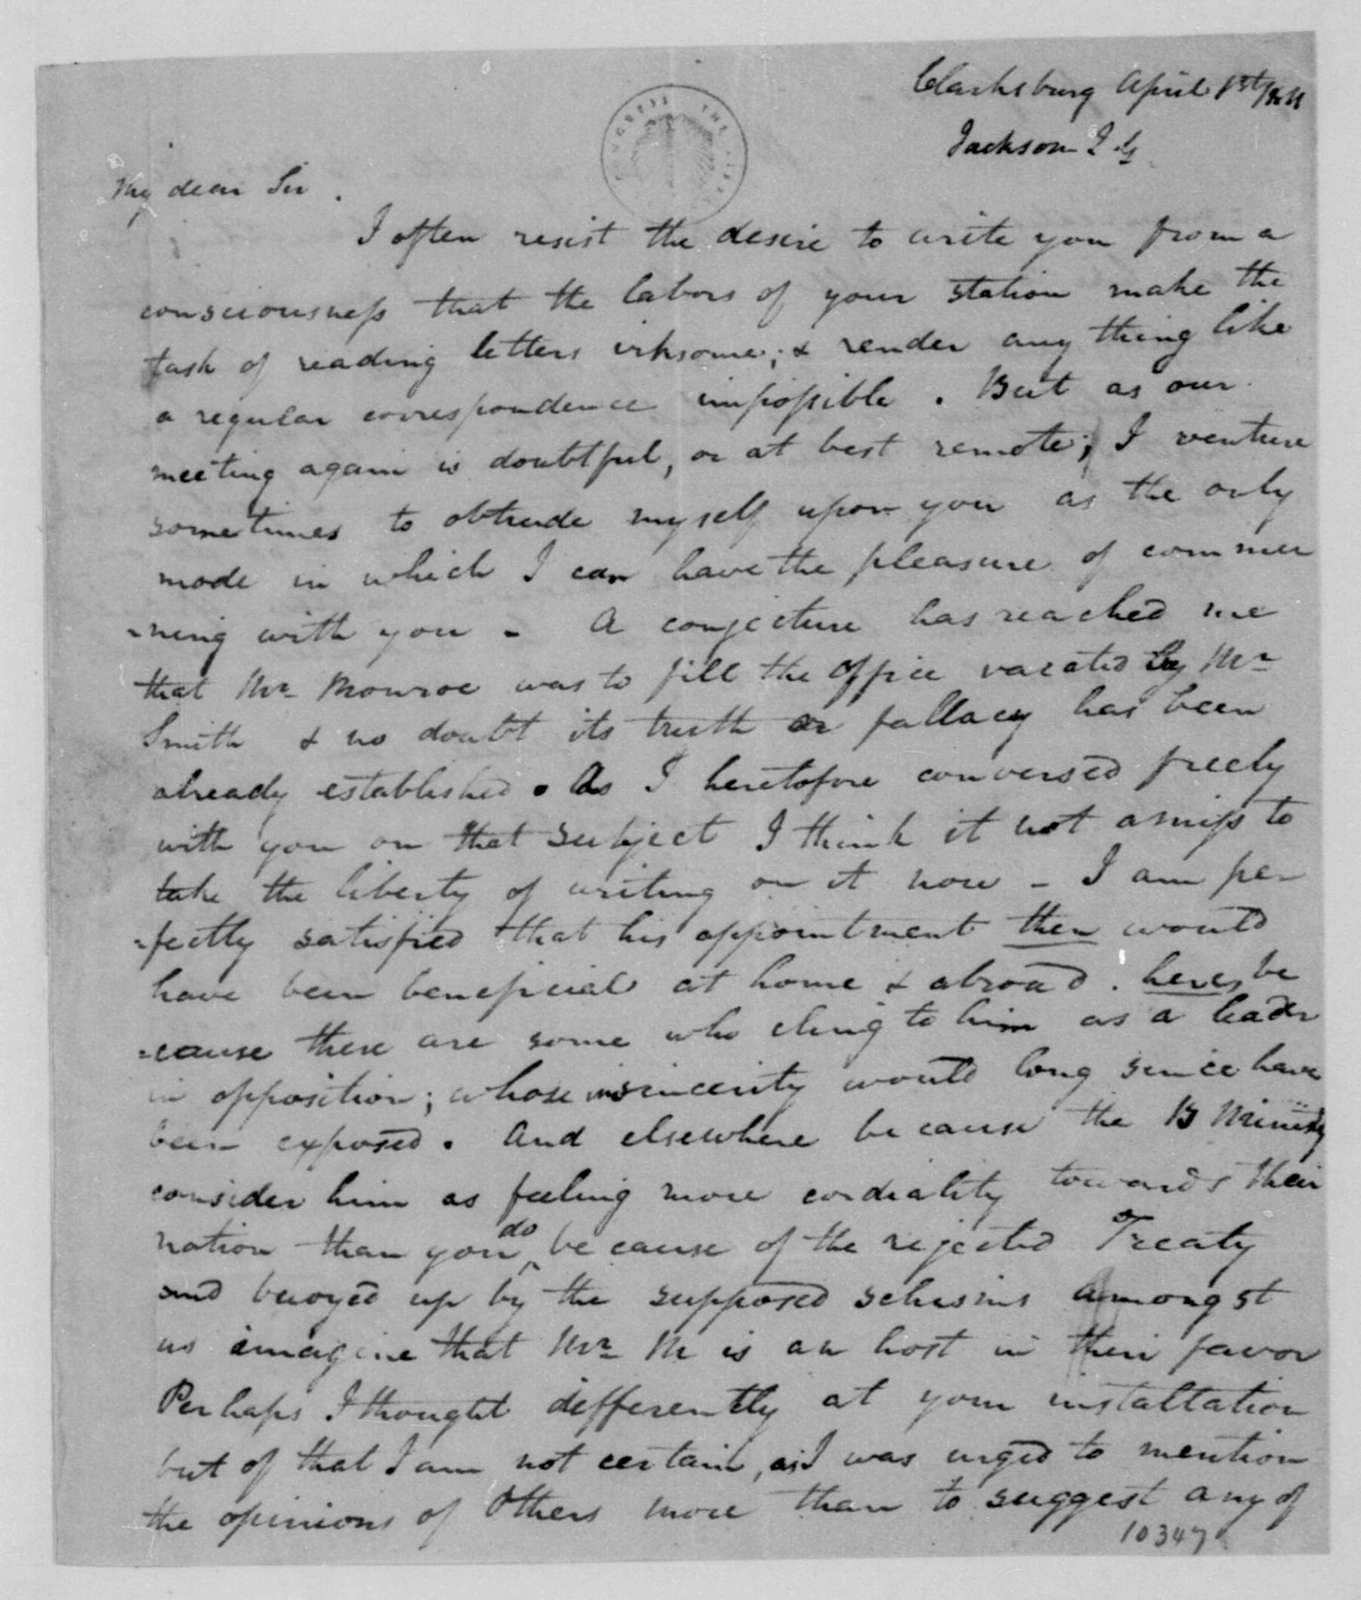 John G. Jackson to James Madison, April 1, 1811.